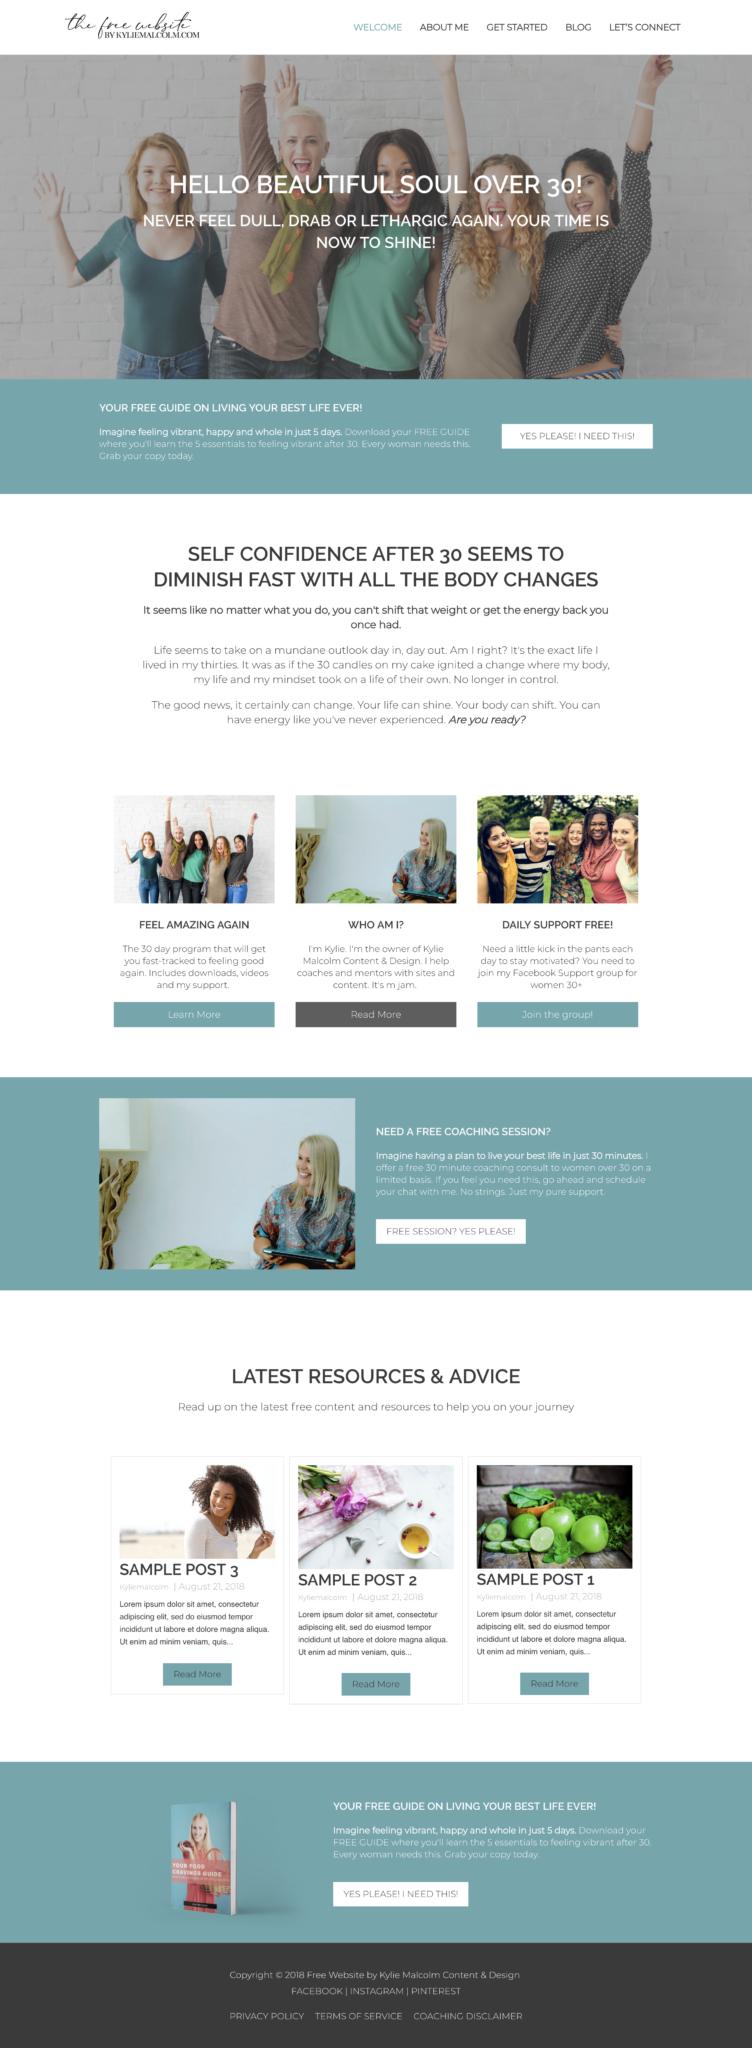 screencapture-freewebsite-kyliemalcolm-2018-08-22-16_21_34